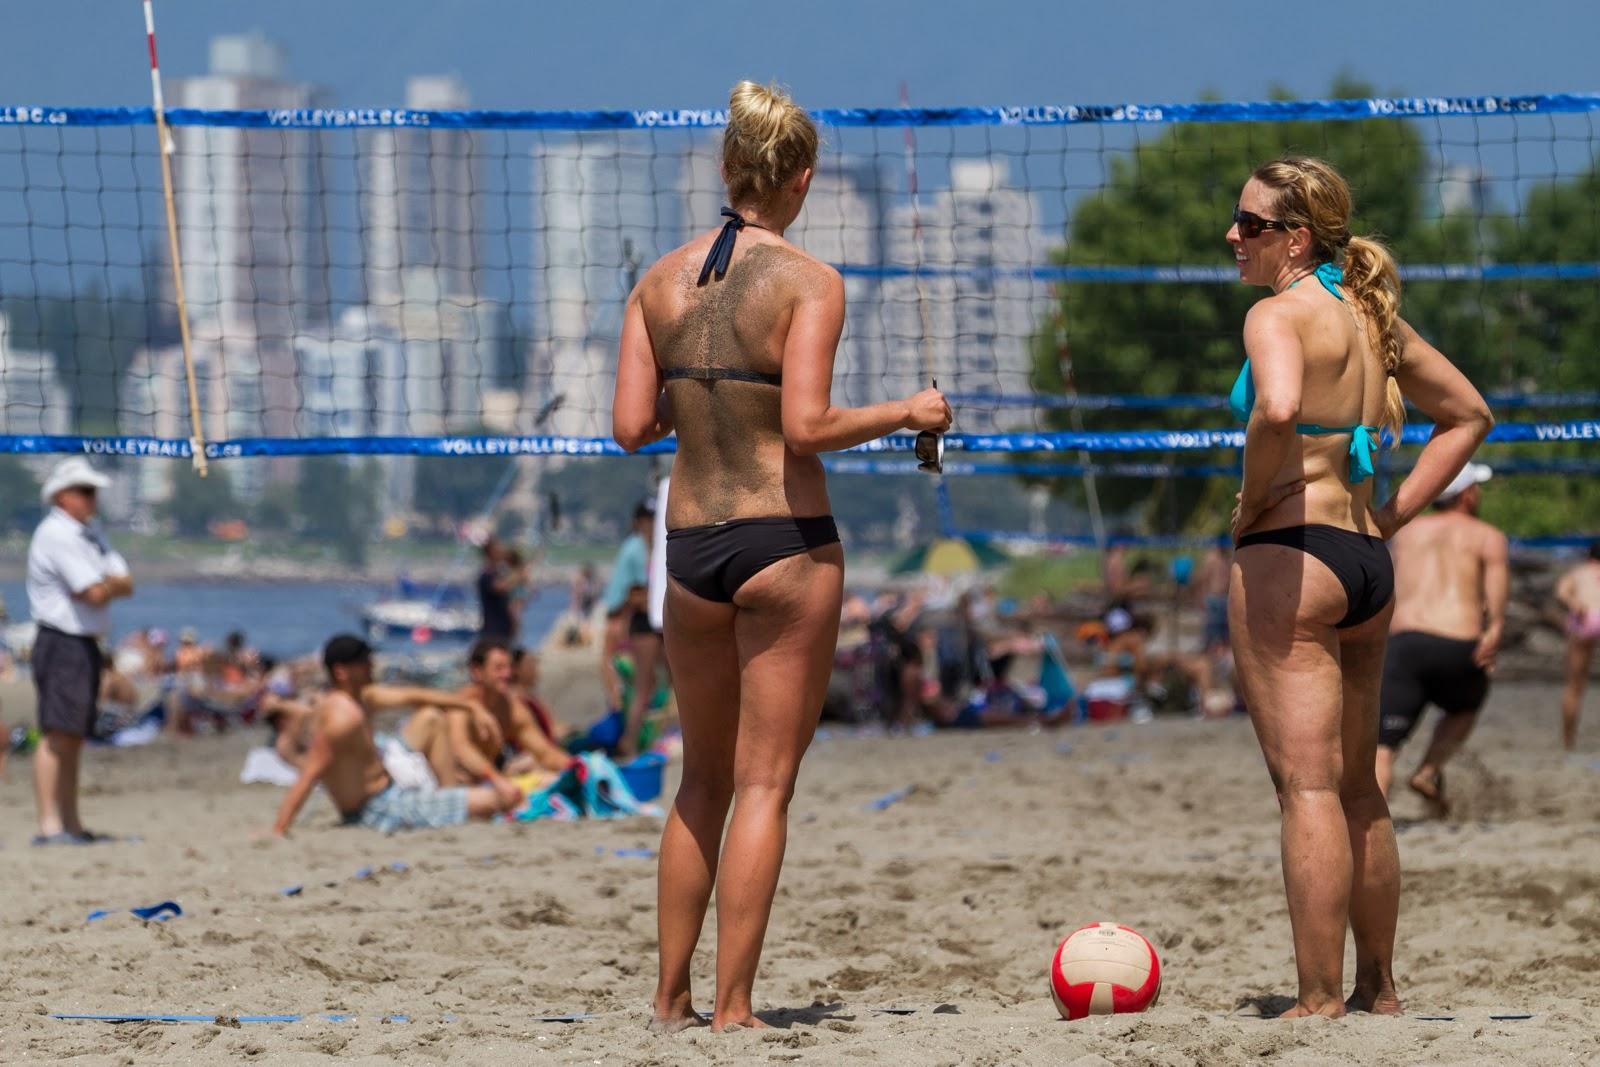 videos de voleibol femenil: